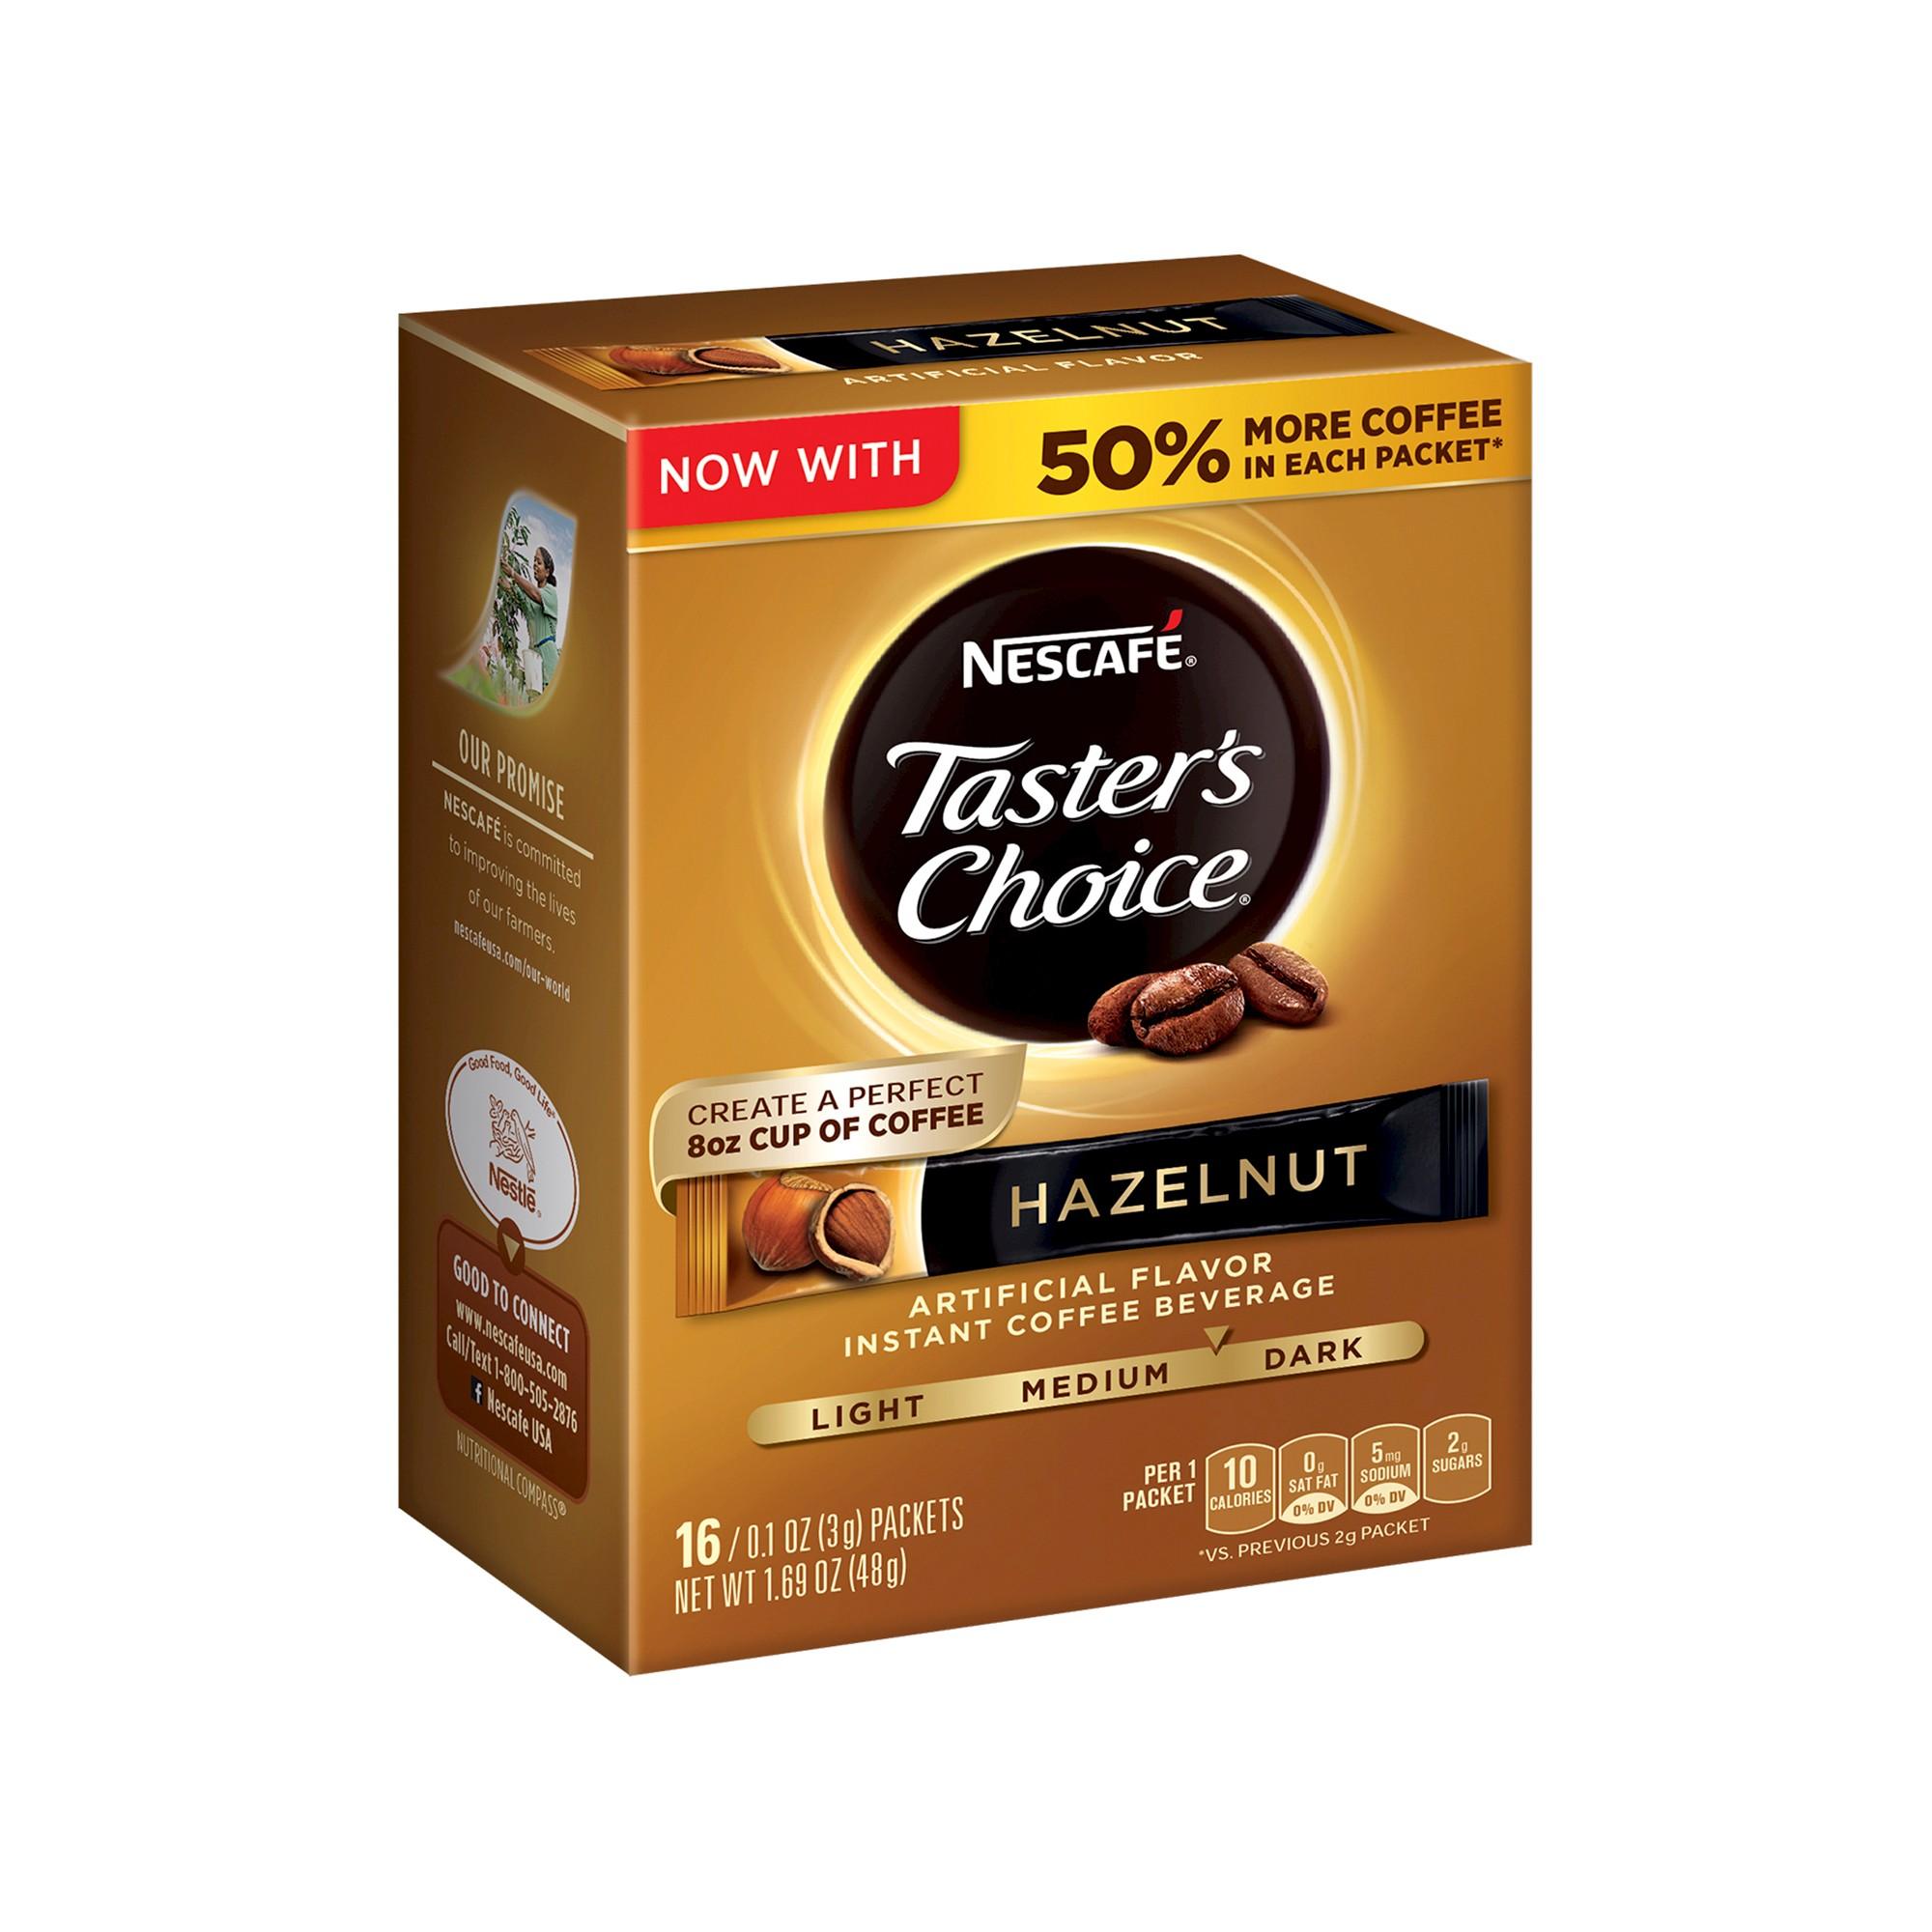 Nescafé, Taster's Choice, Instant Coffee Beverage